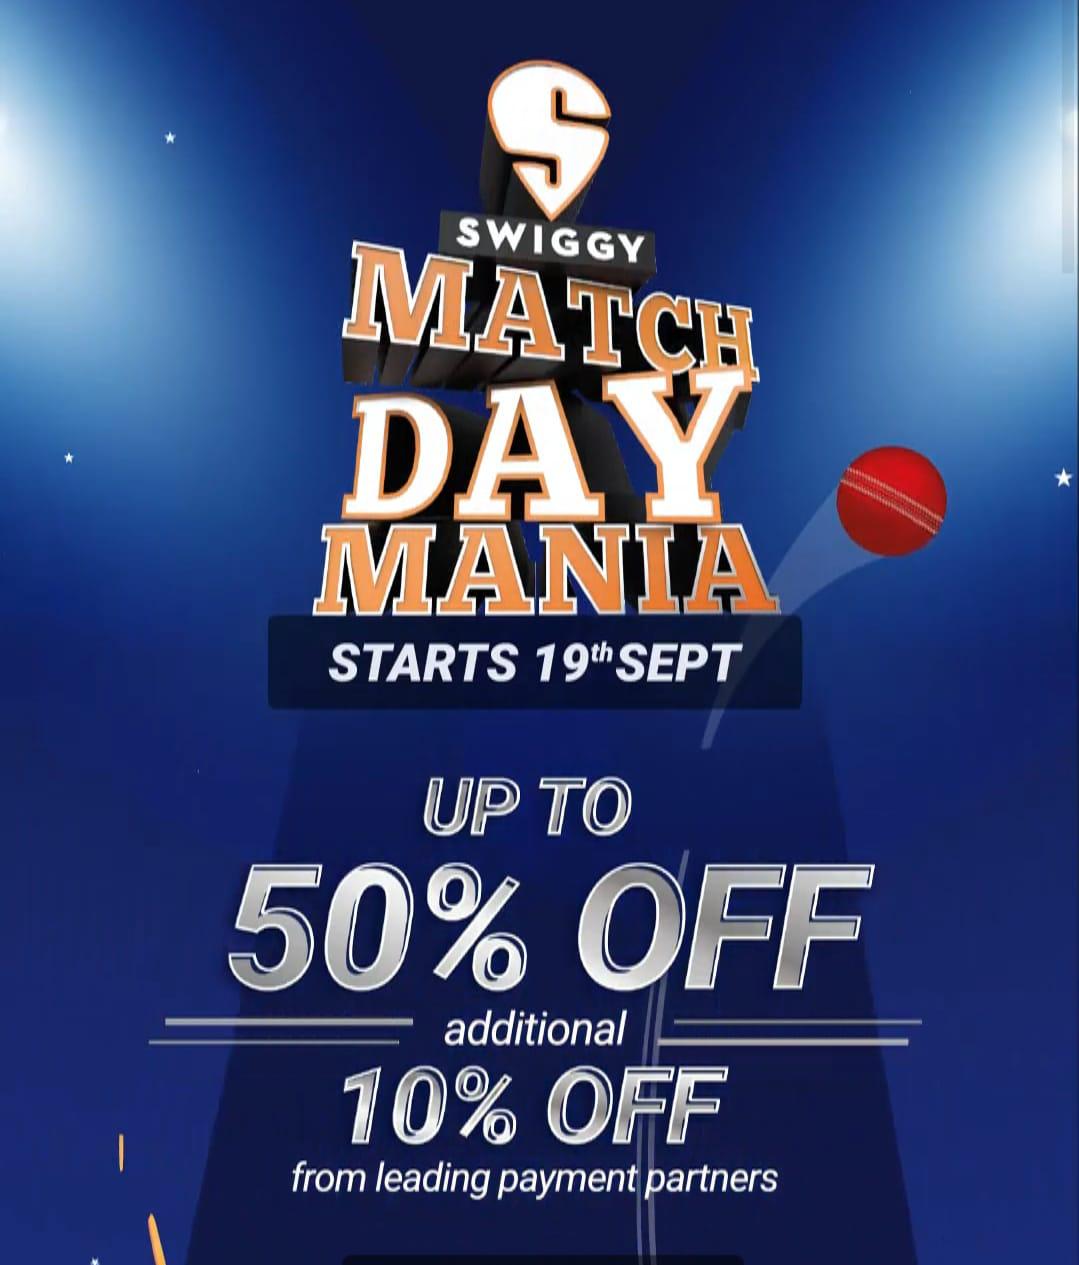 Swiggy Match Day Mania Offers